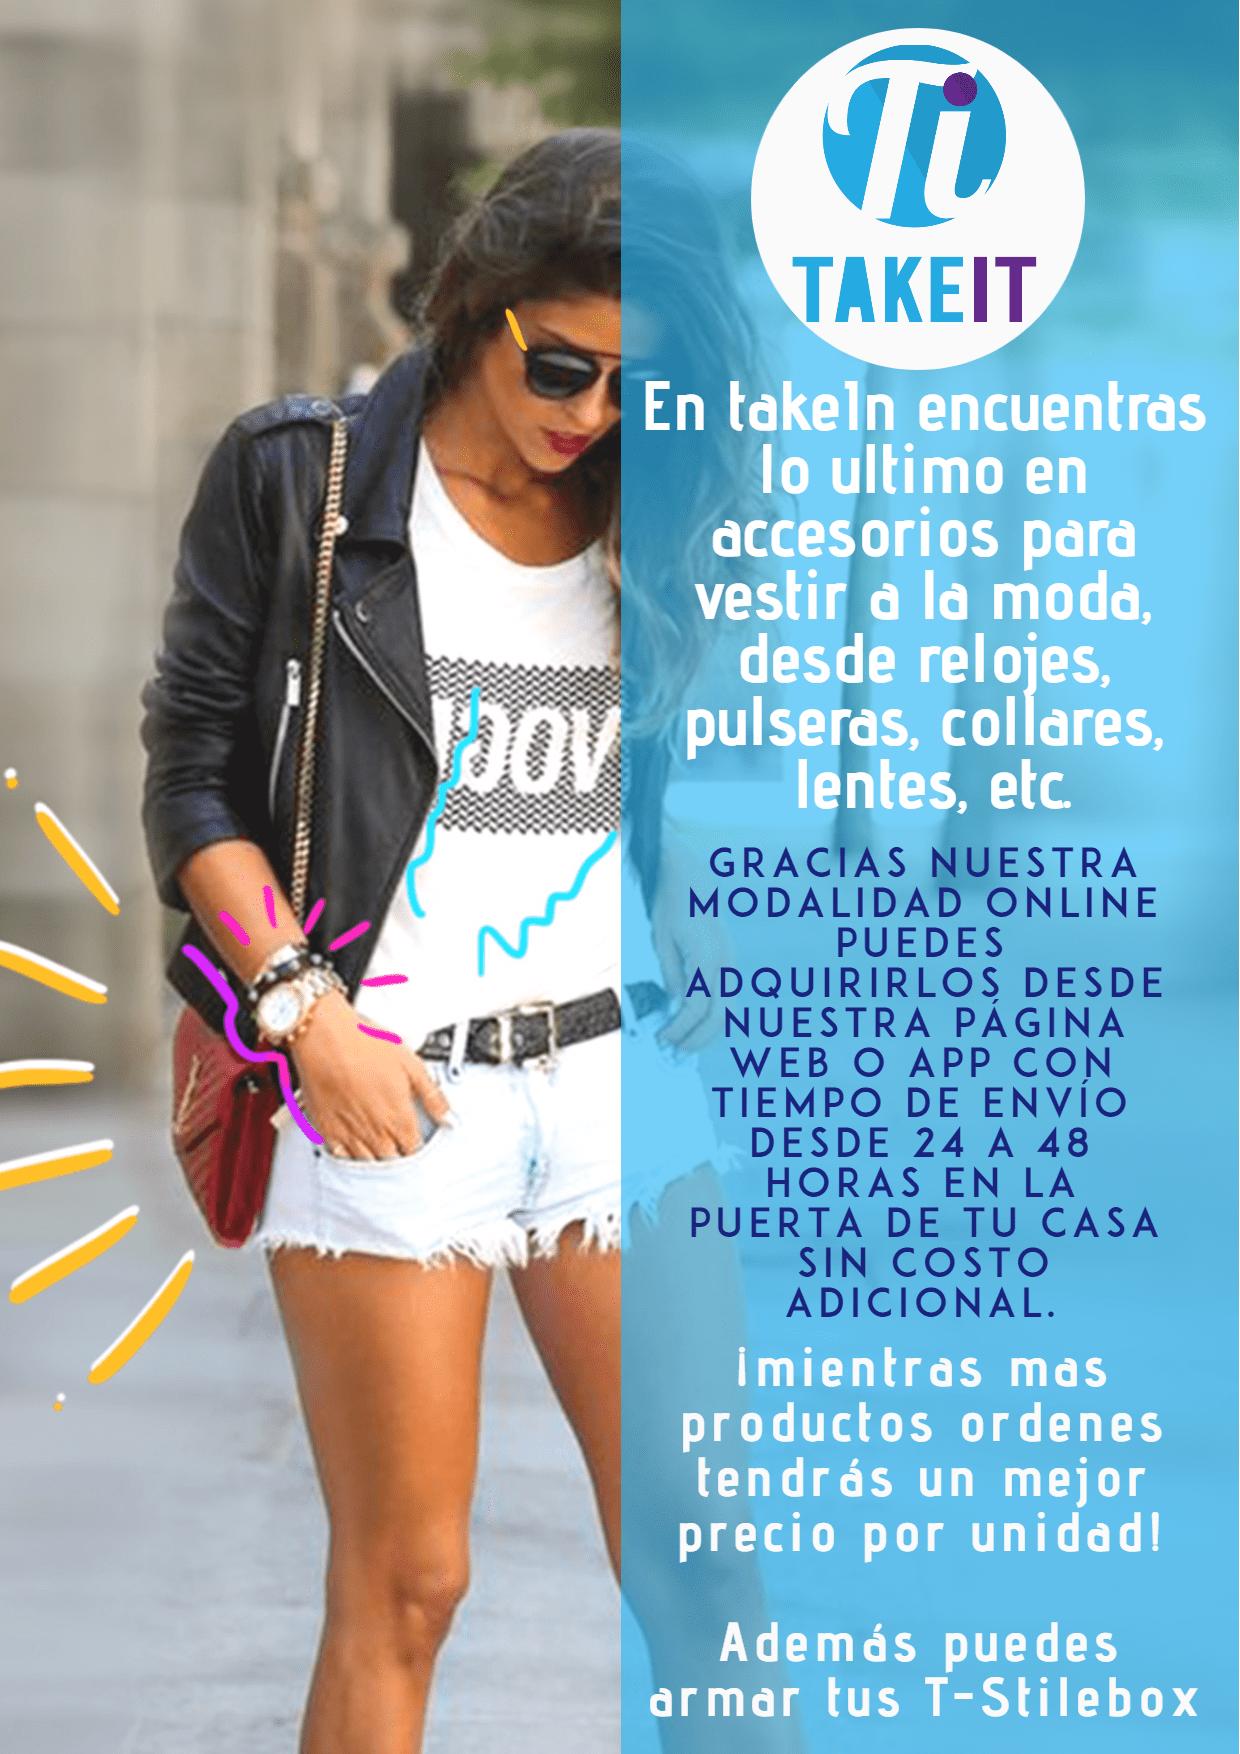 Blue,                Advertising,                Electric,                Shorts,                Denim,                Poster,                Luxury,                Quote,                Love,                White,                Black,                Aqua,                 Free Image